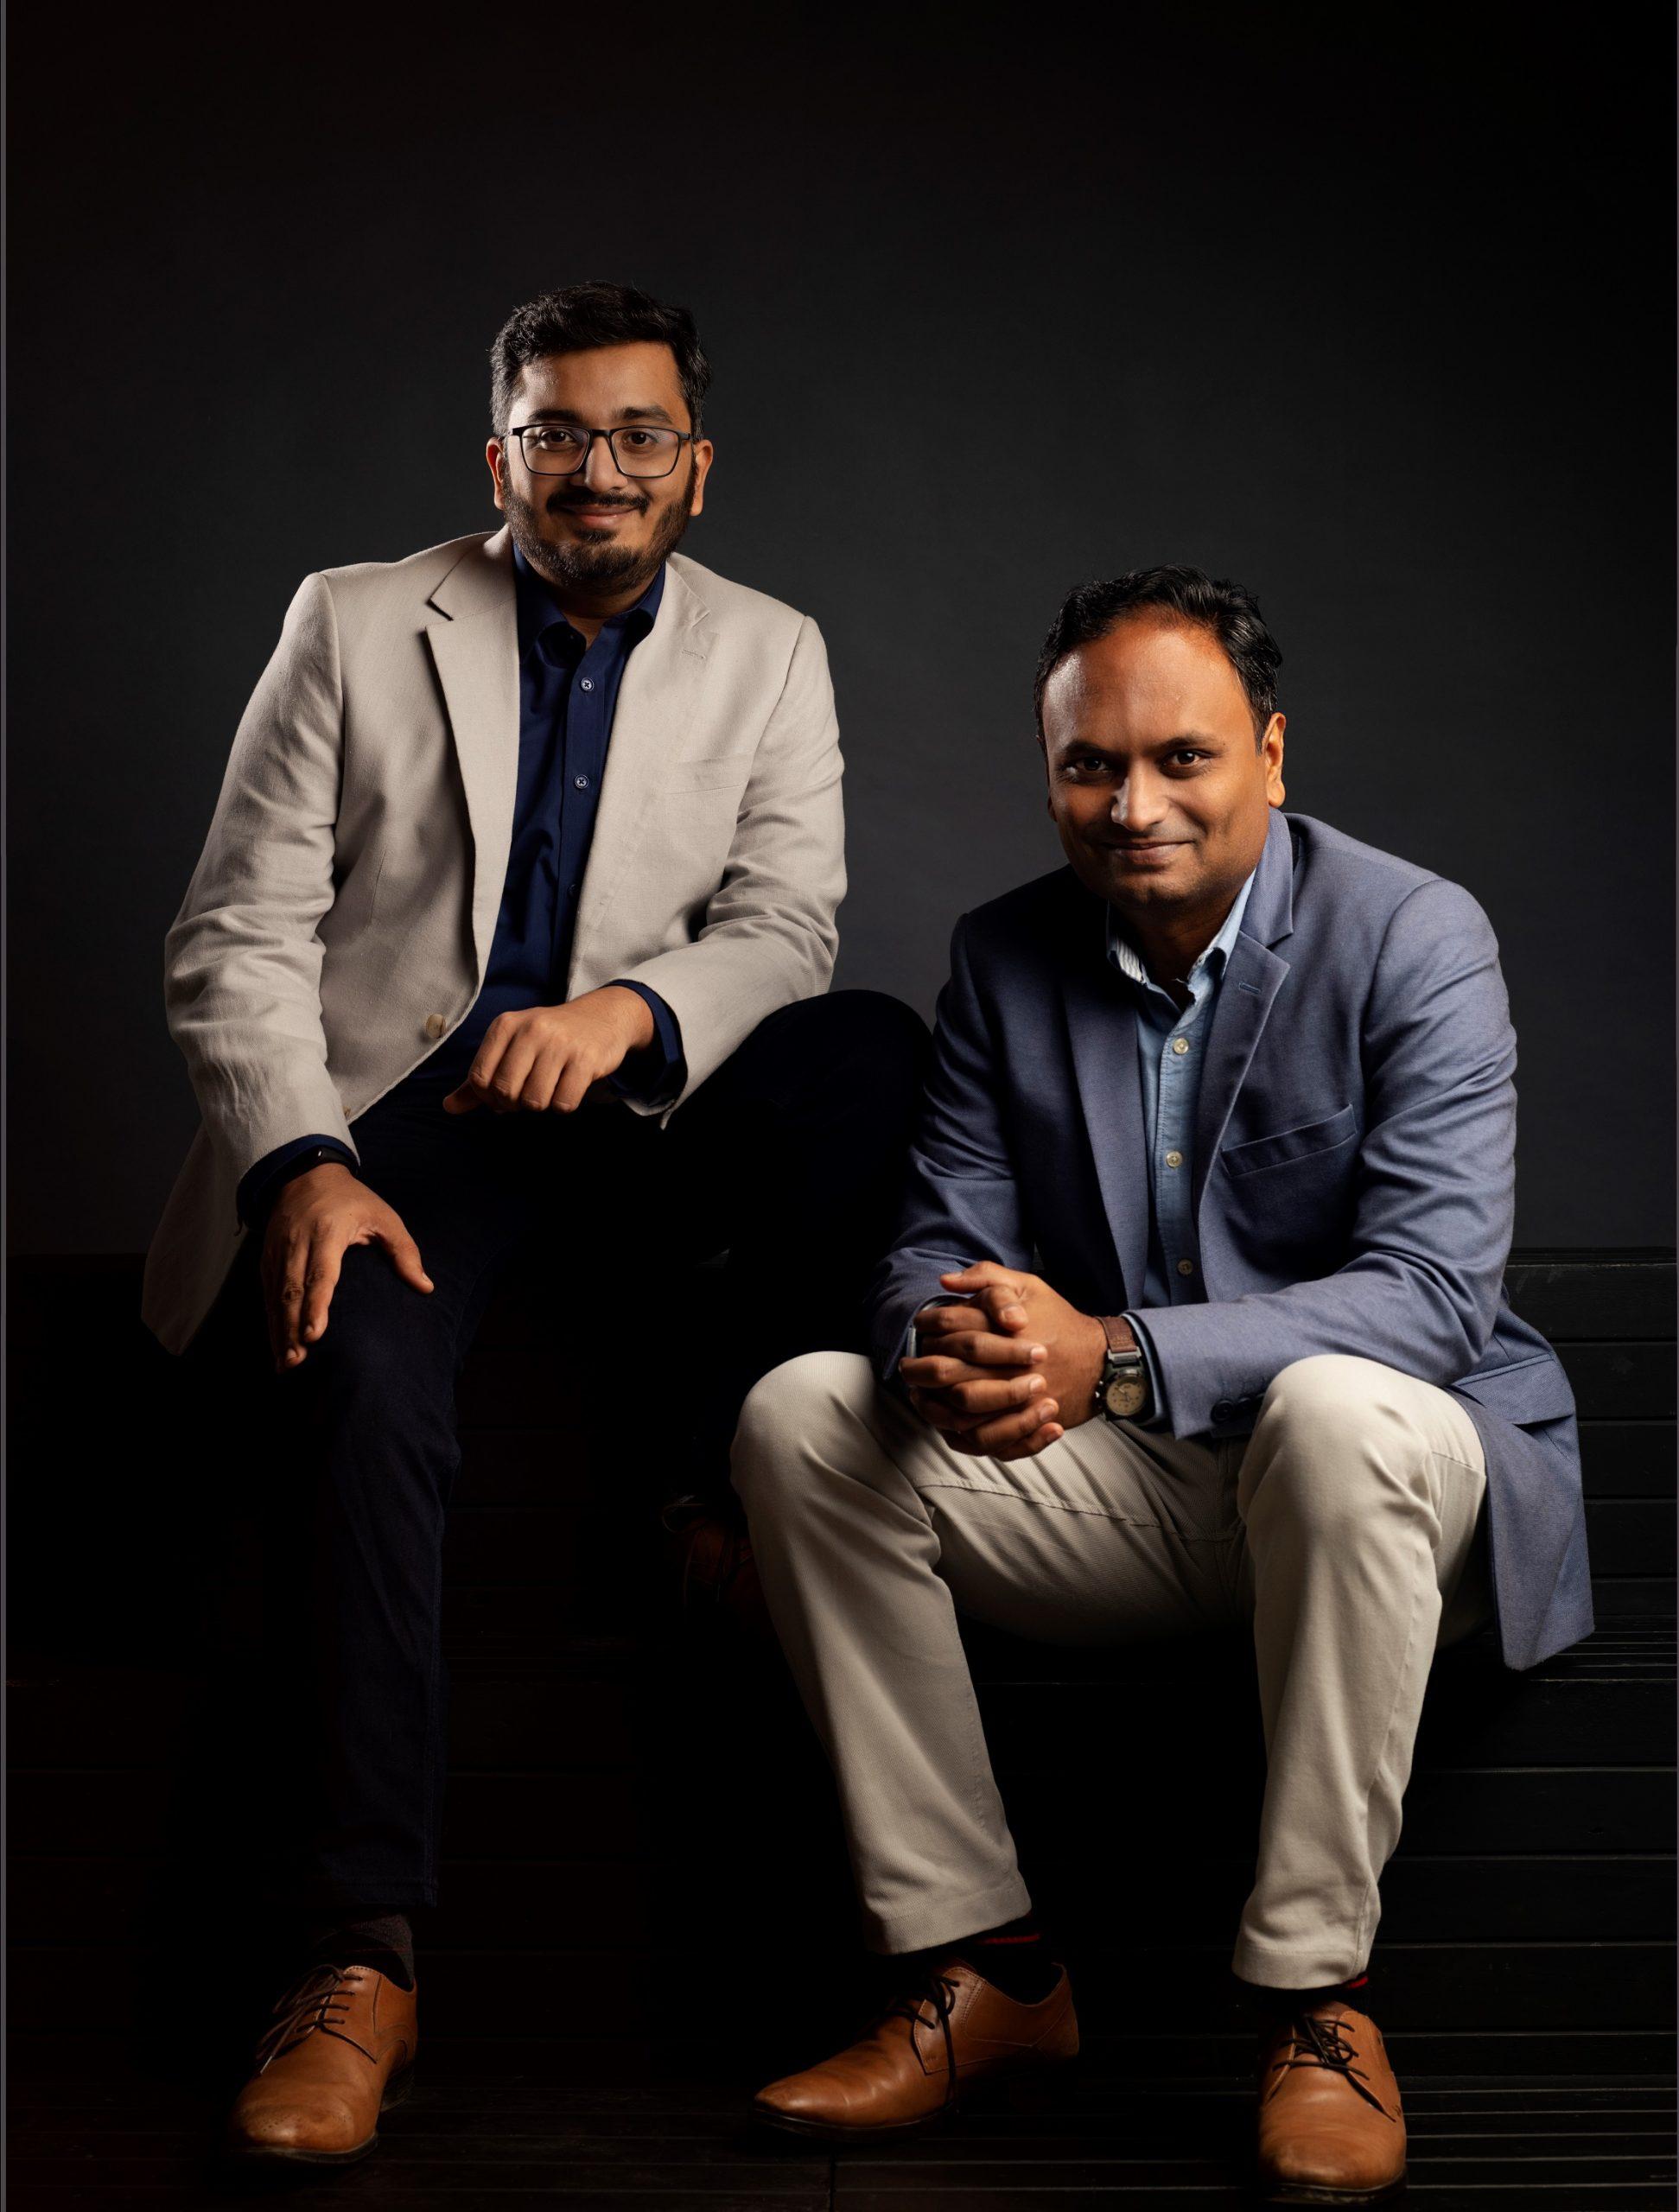 Kevin Parekh & Ashish Korde, Founders, Proeon